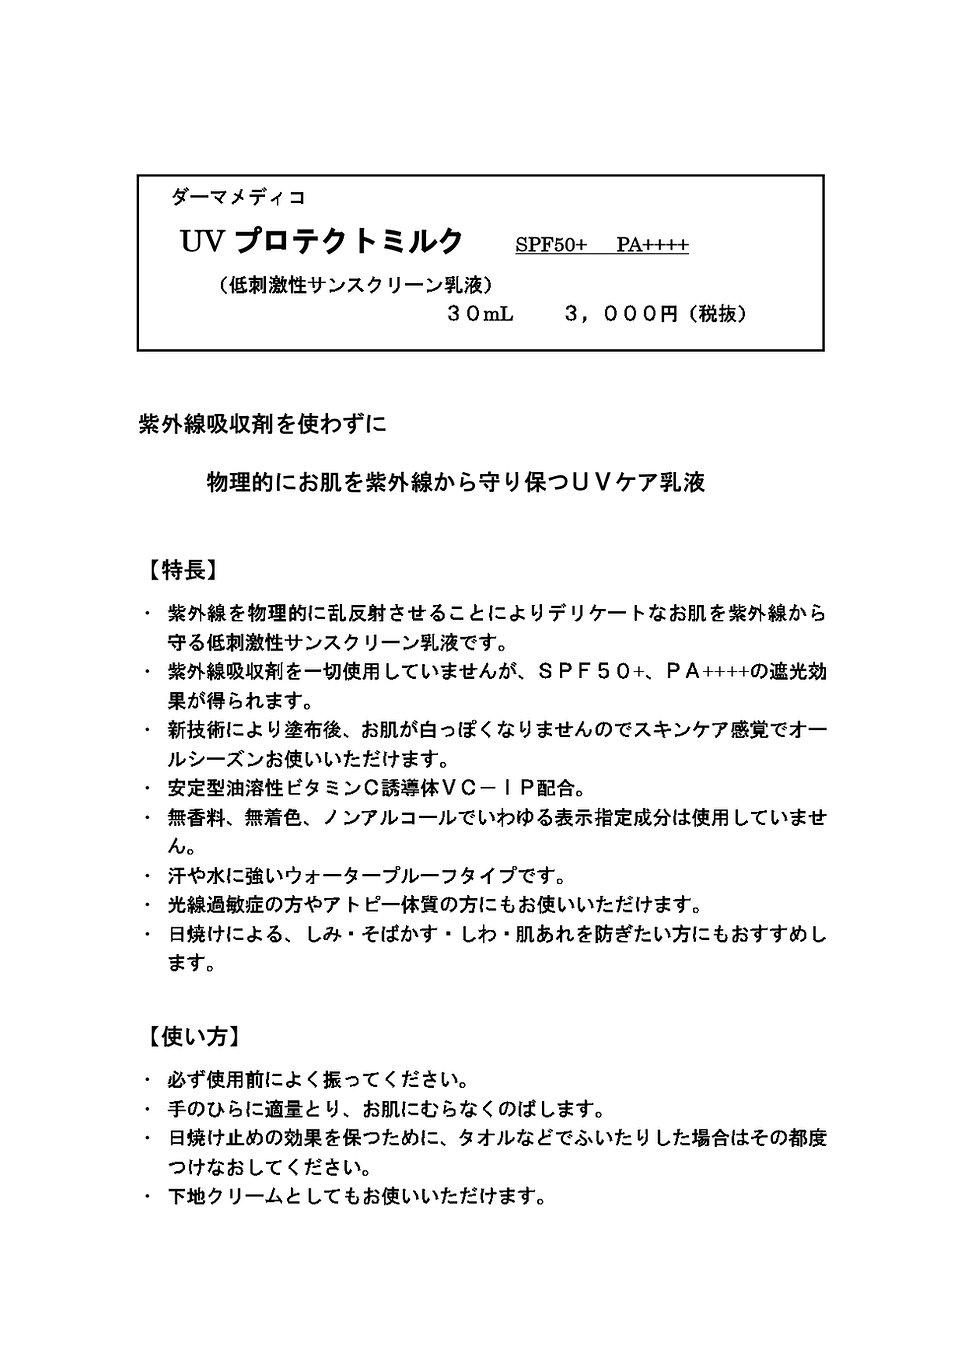 『UVプロテクトミルク』_page-0001.jpg